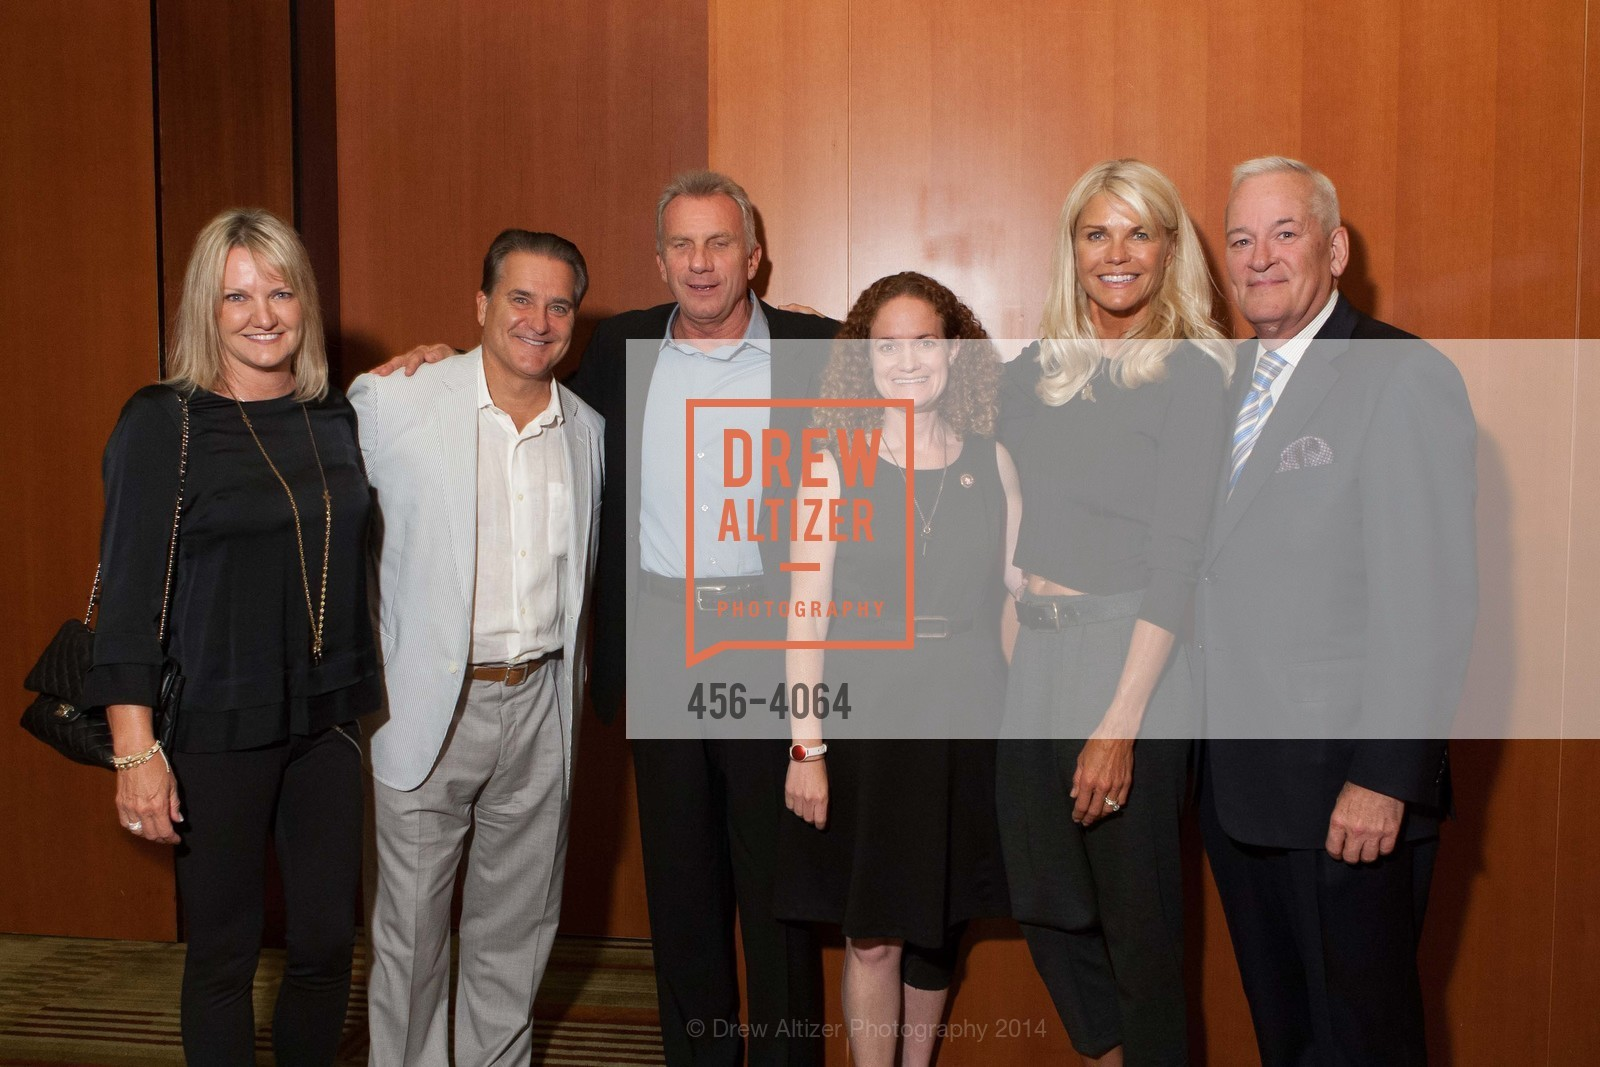 Gayle Mariucci, Steve Mariucci, Joe Montana, Joanne Pasternack, Jennifer Montana, Tracy Mercer, Photo #456-4064